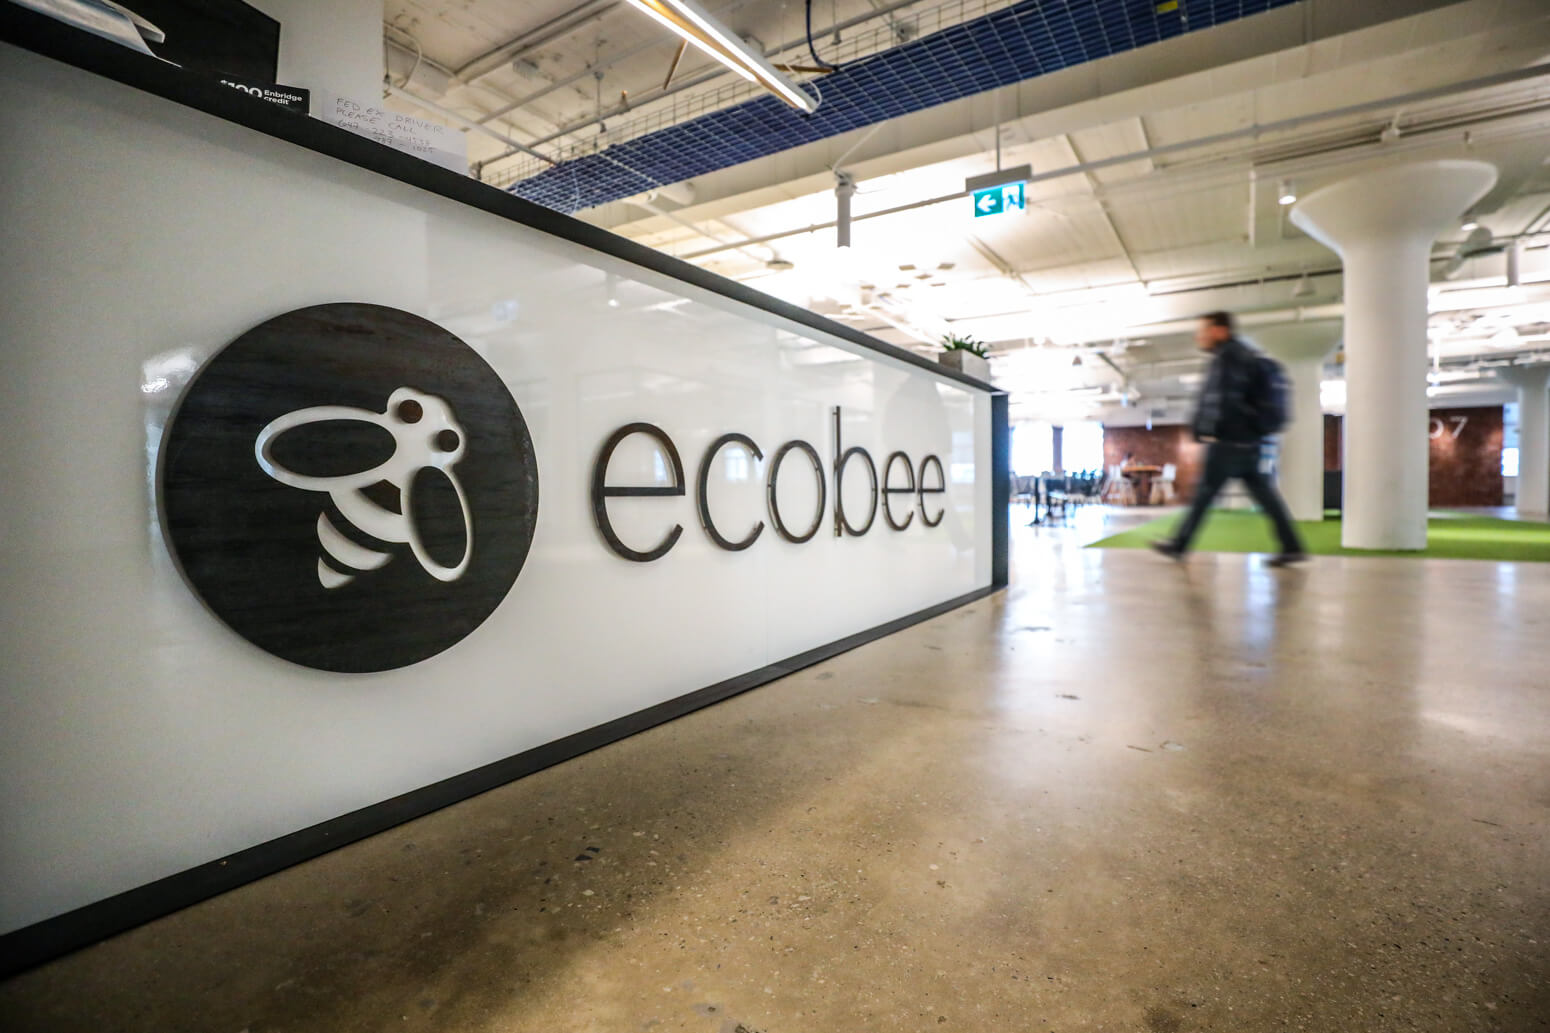 Ecobee Toronto Office Killer Spaces-9